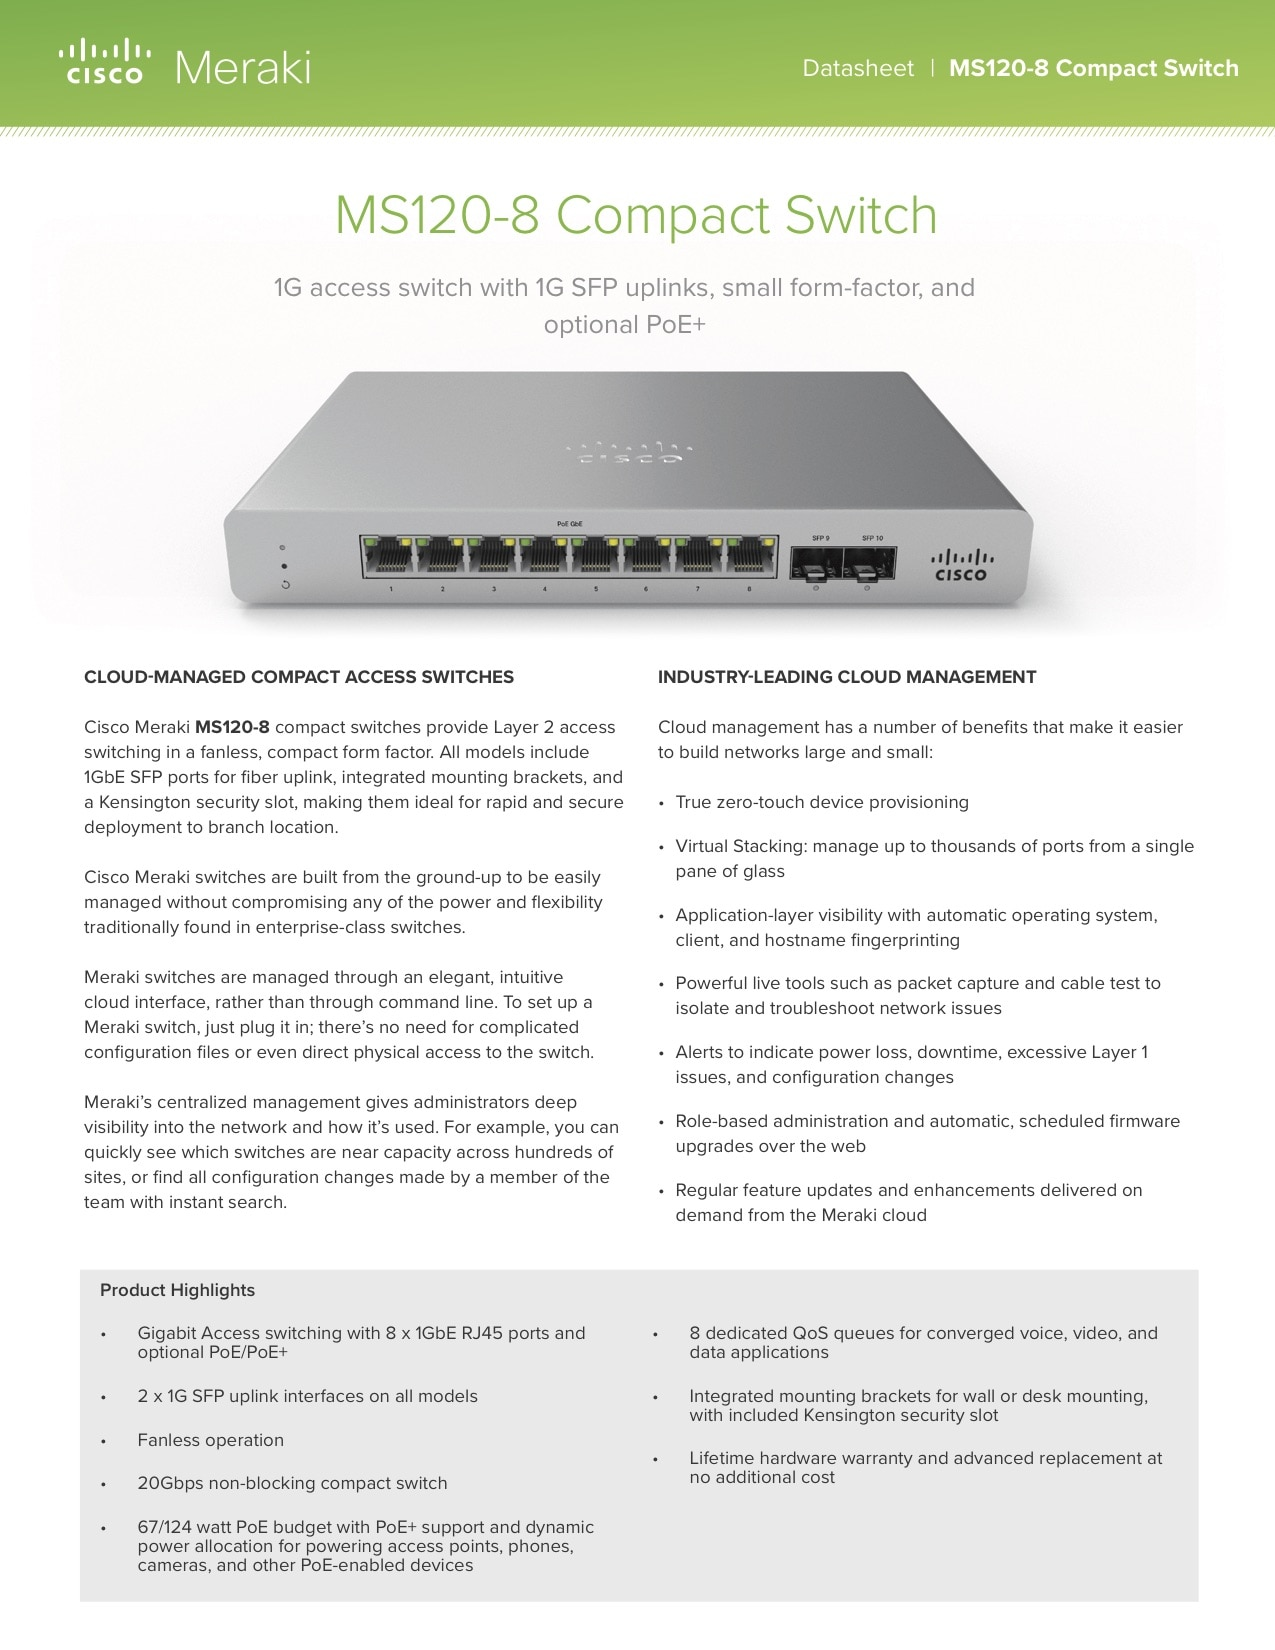 MS120 Compact Series Datasheet